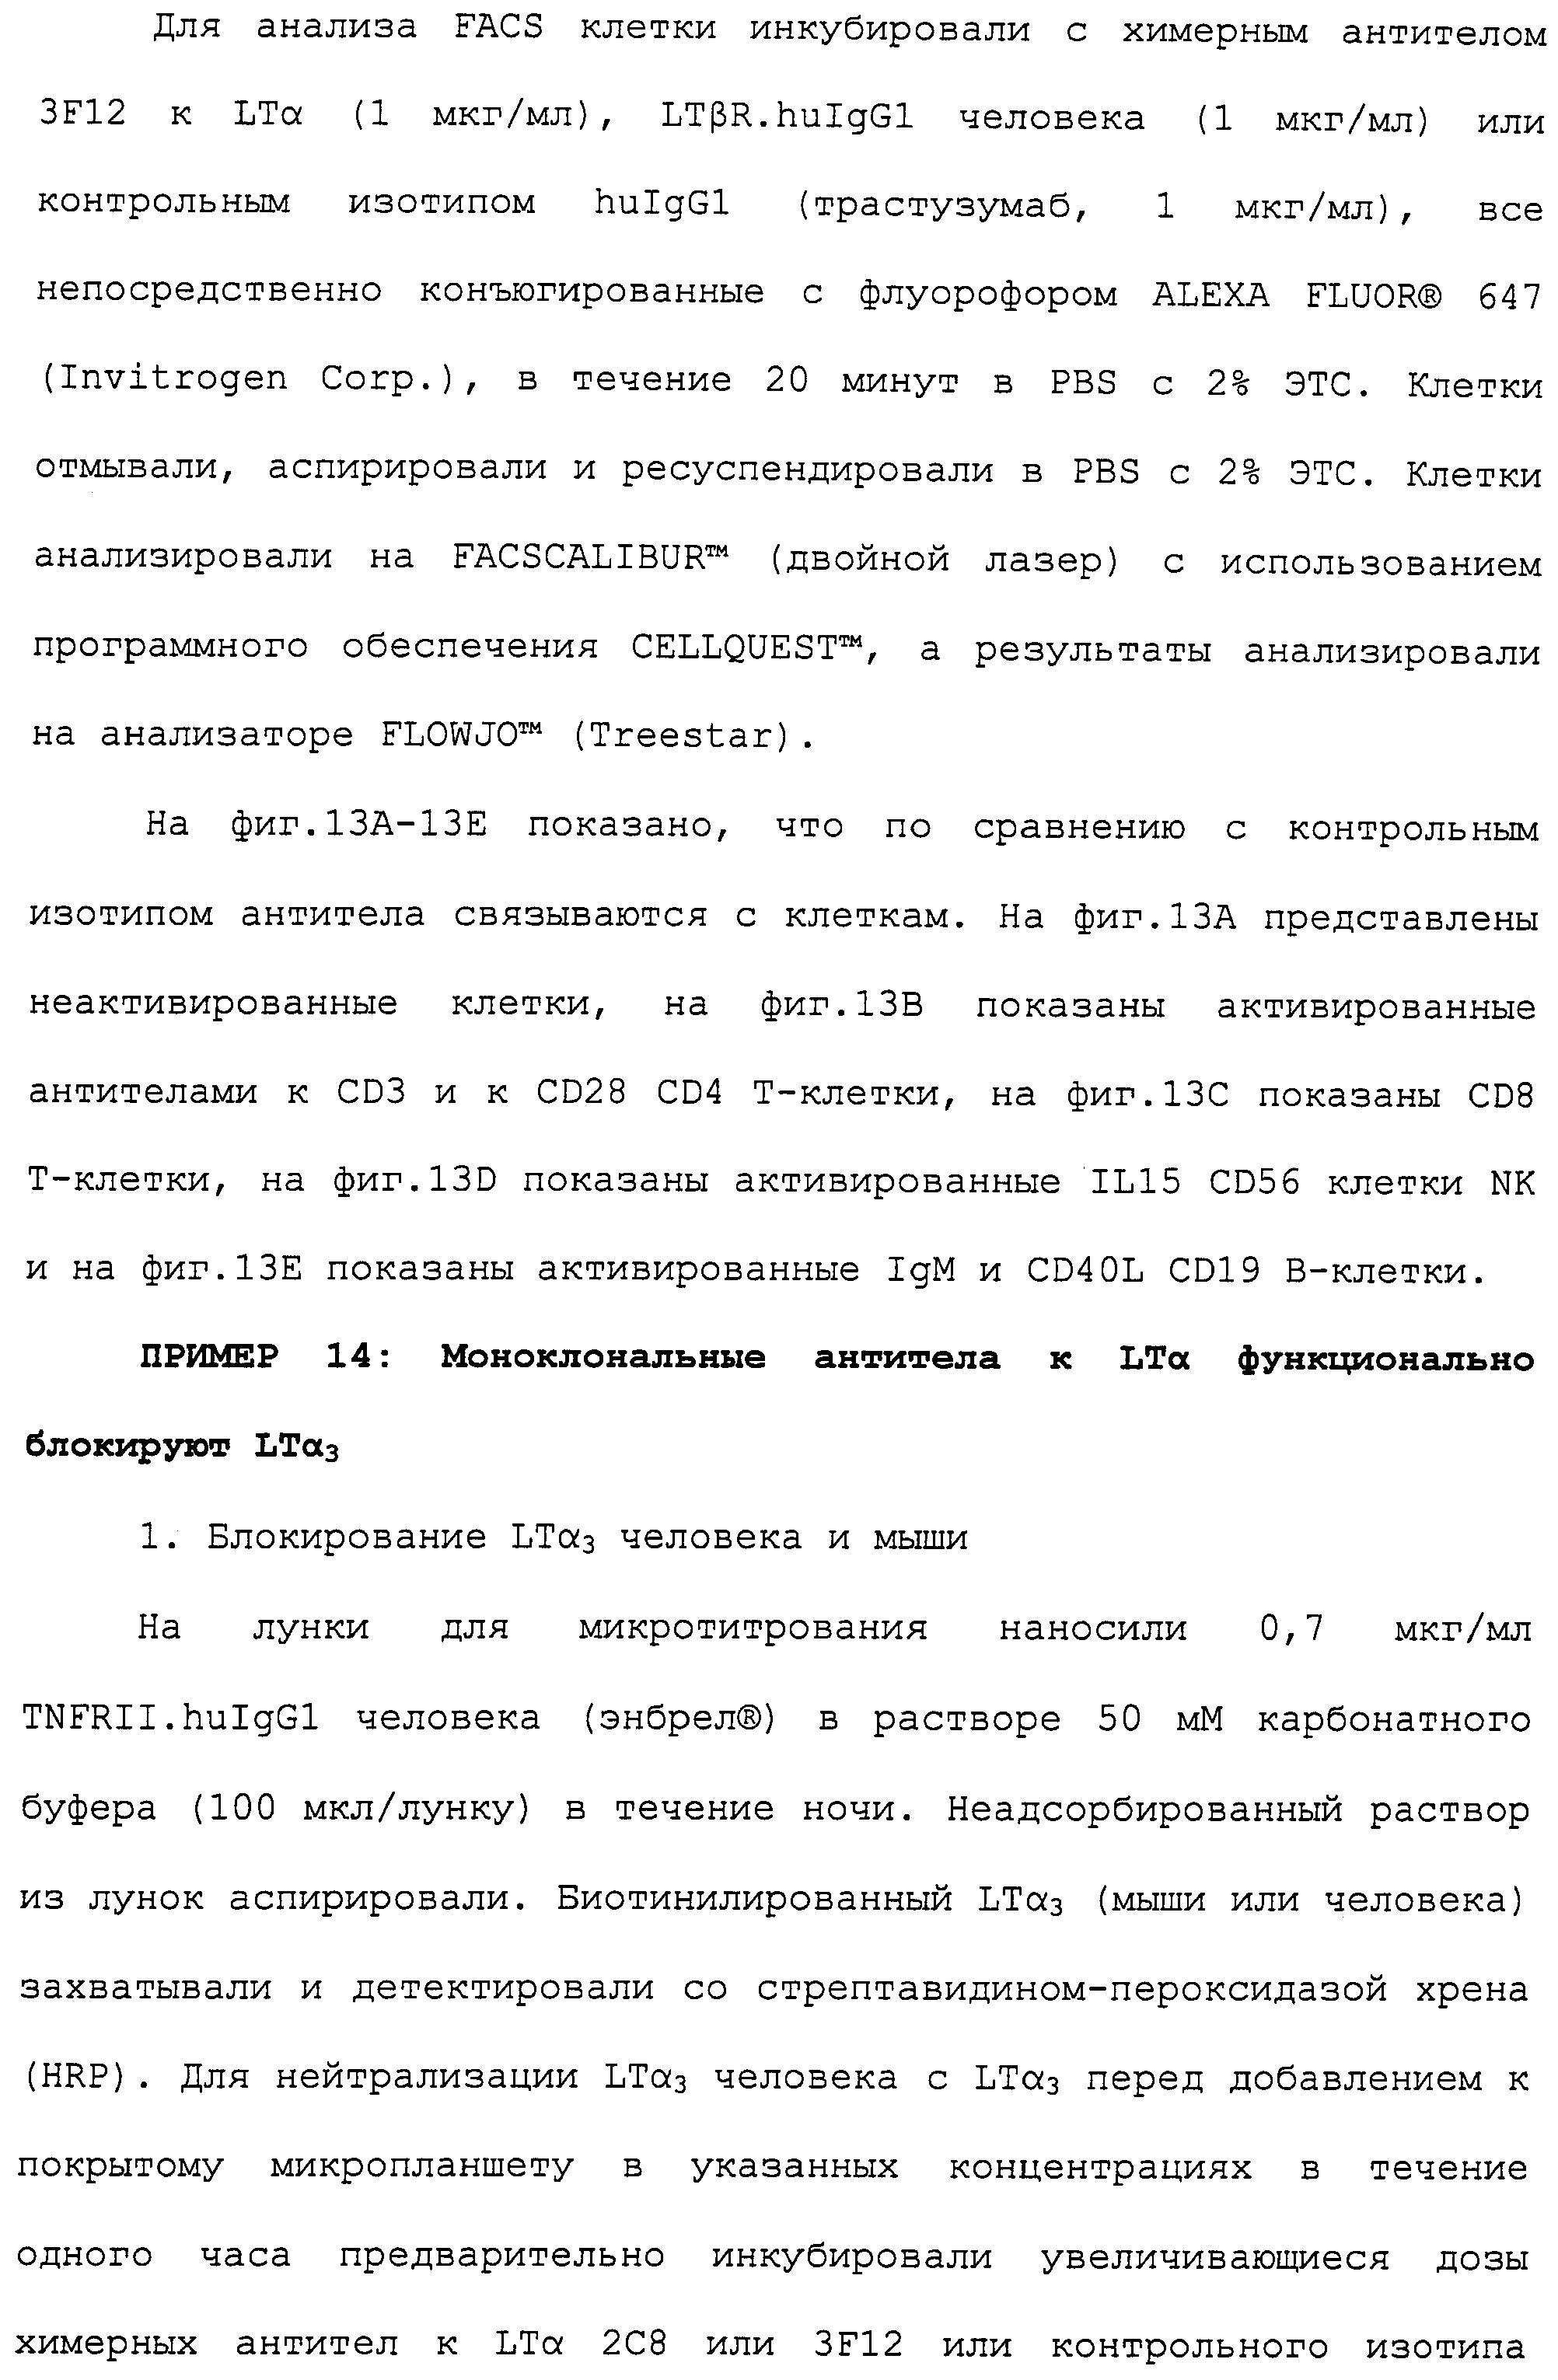 Figure 00000268